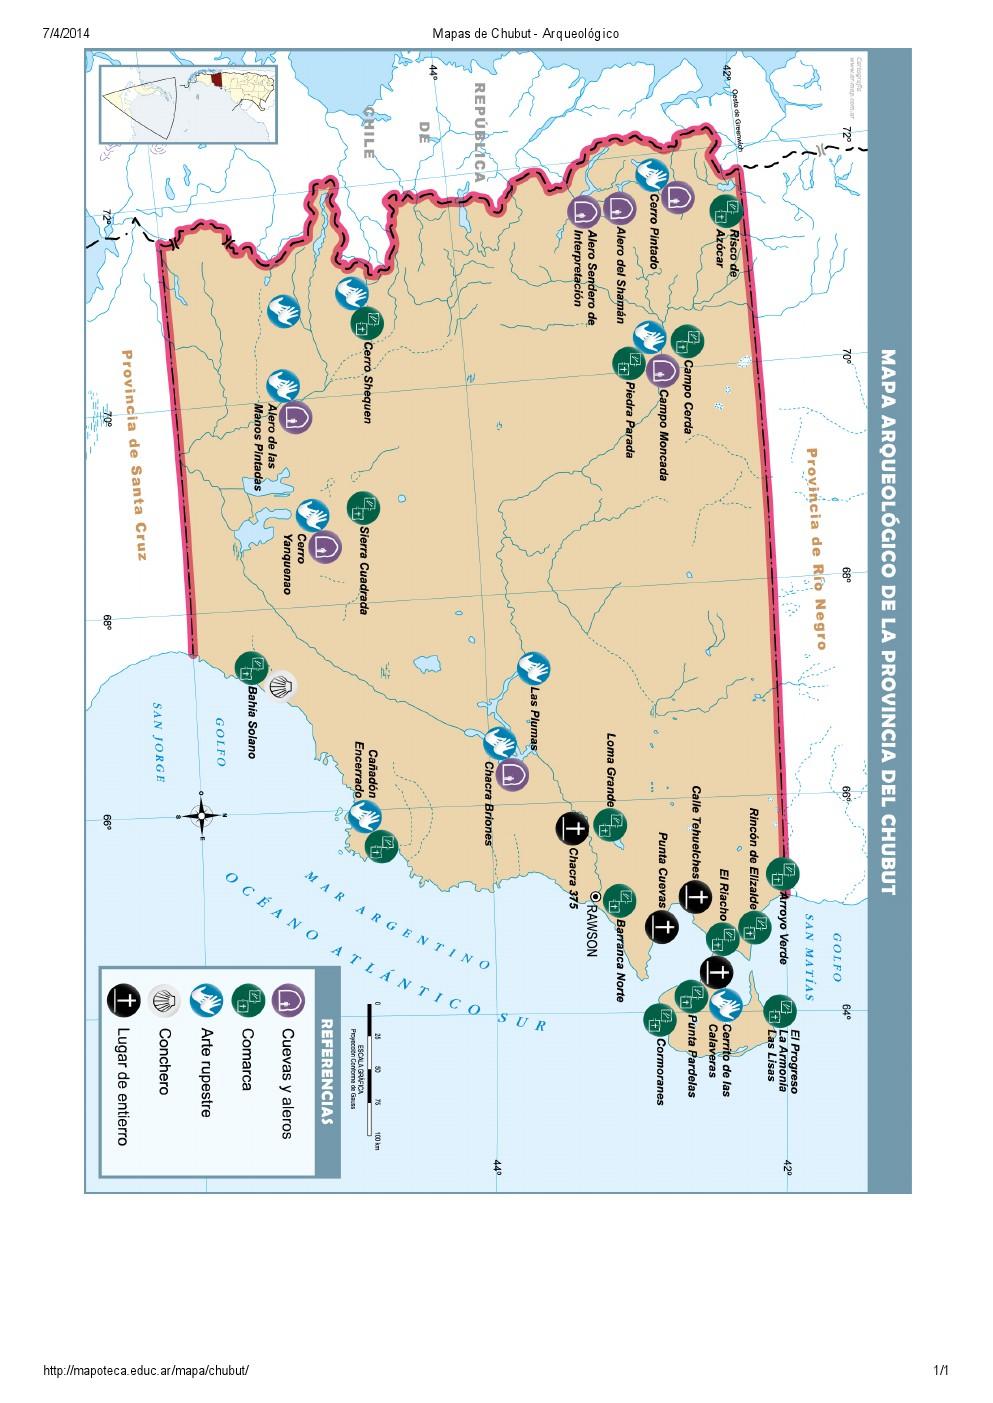 Mapa arqueológico del Chubut. Mapoteca de Educ.ar